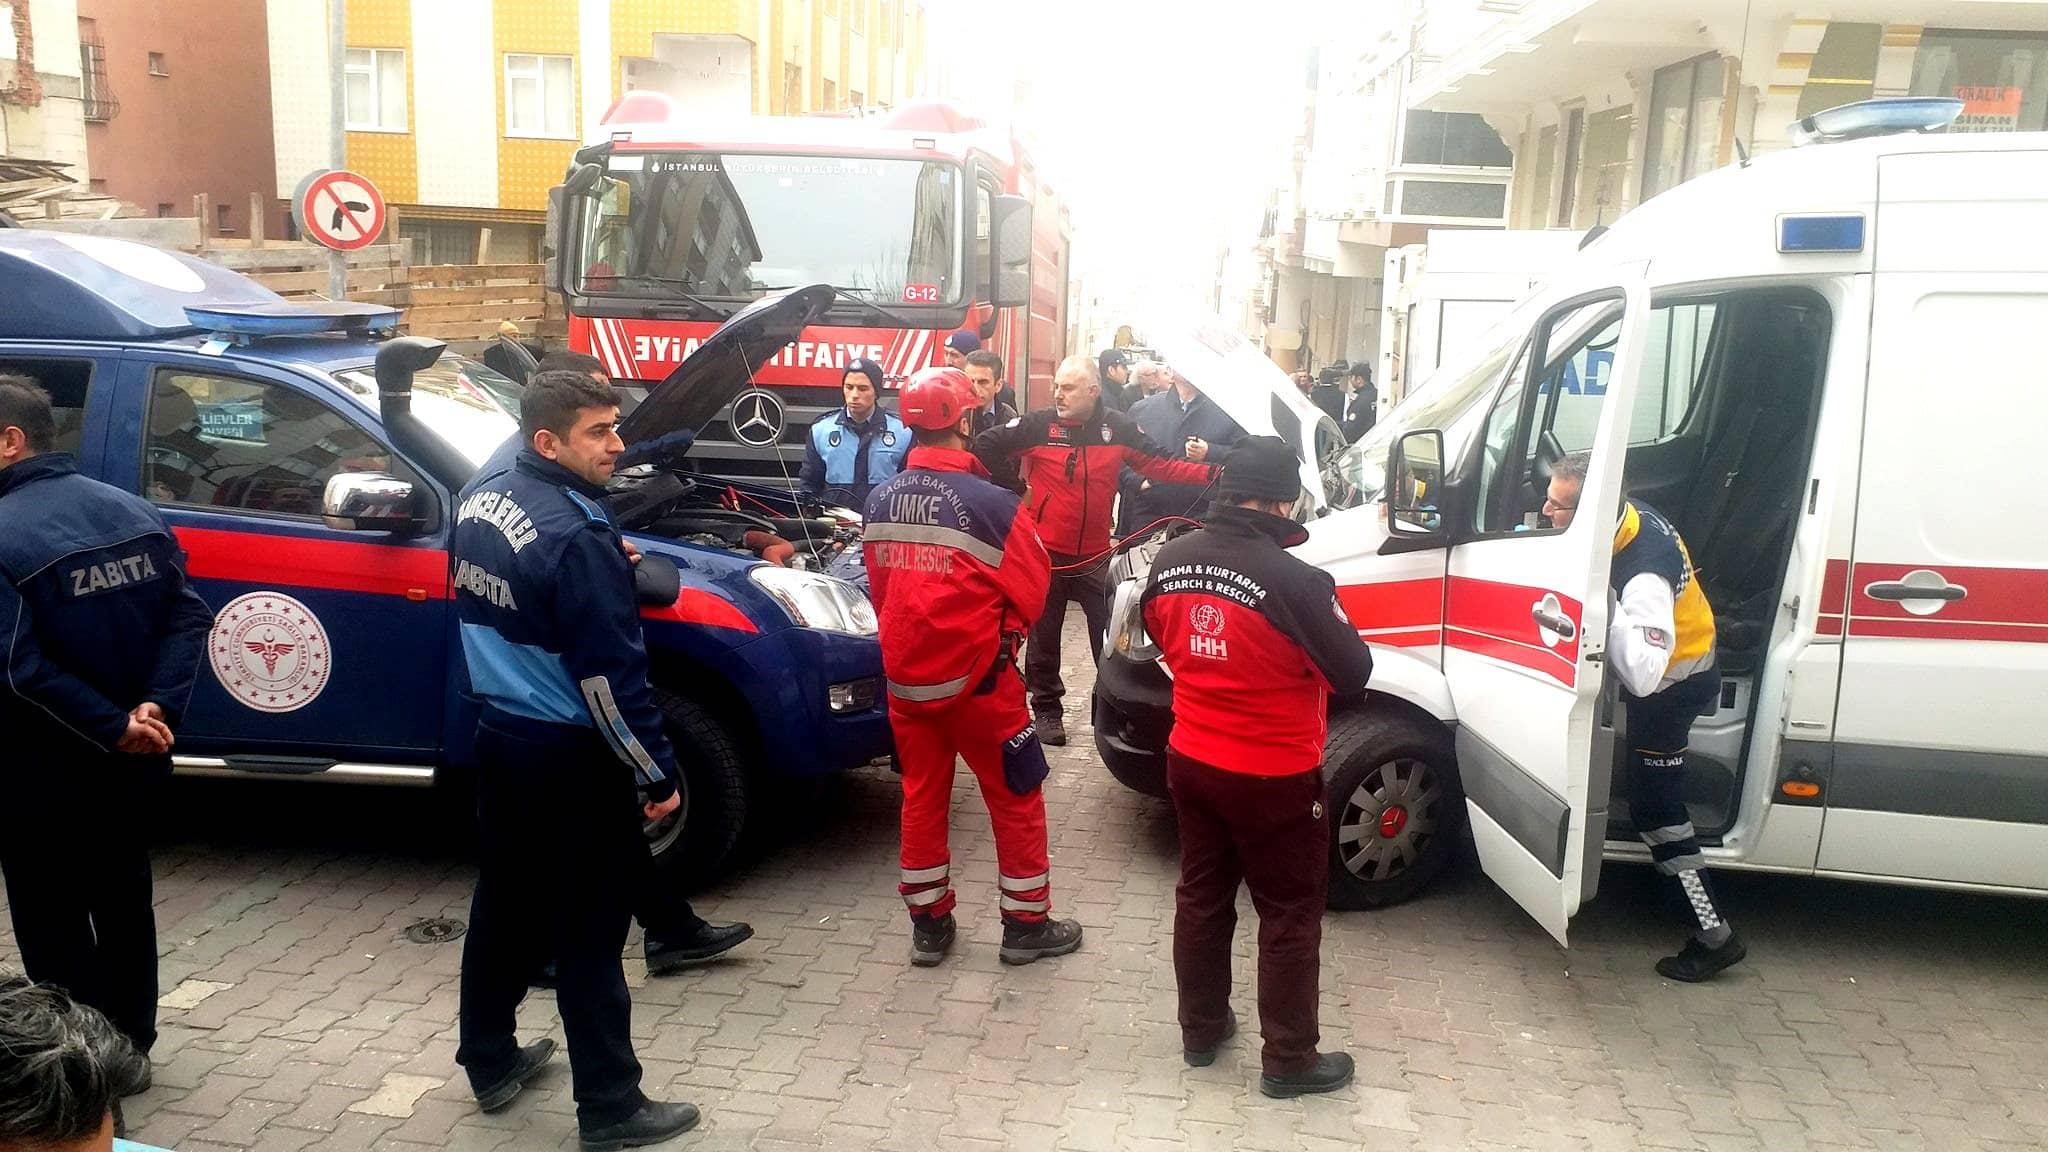 bahçelievler ambulans aküsü bitti